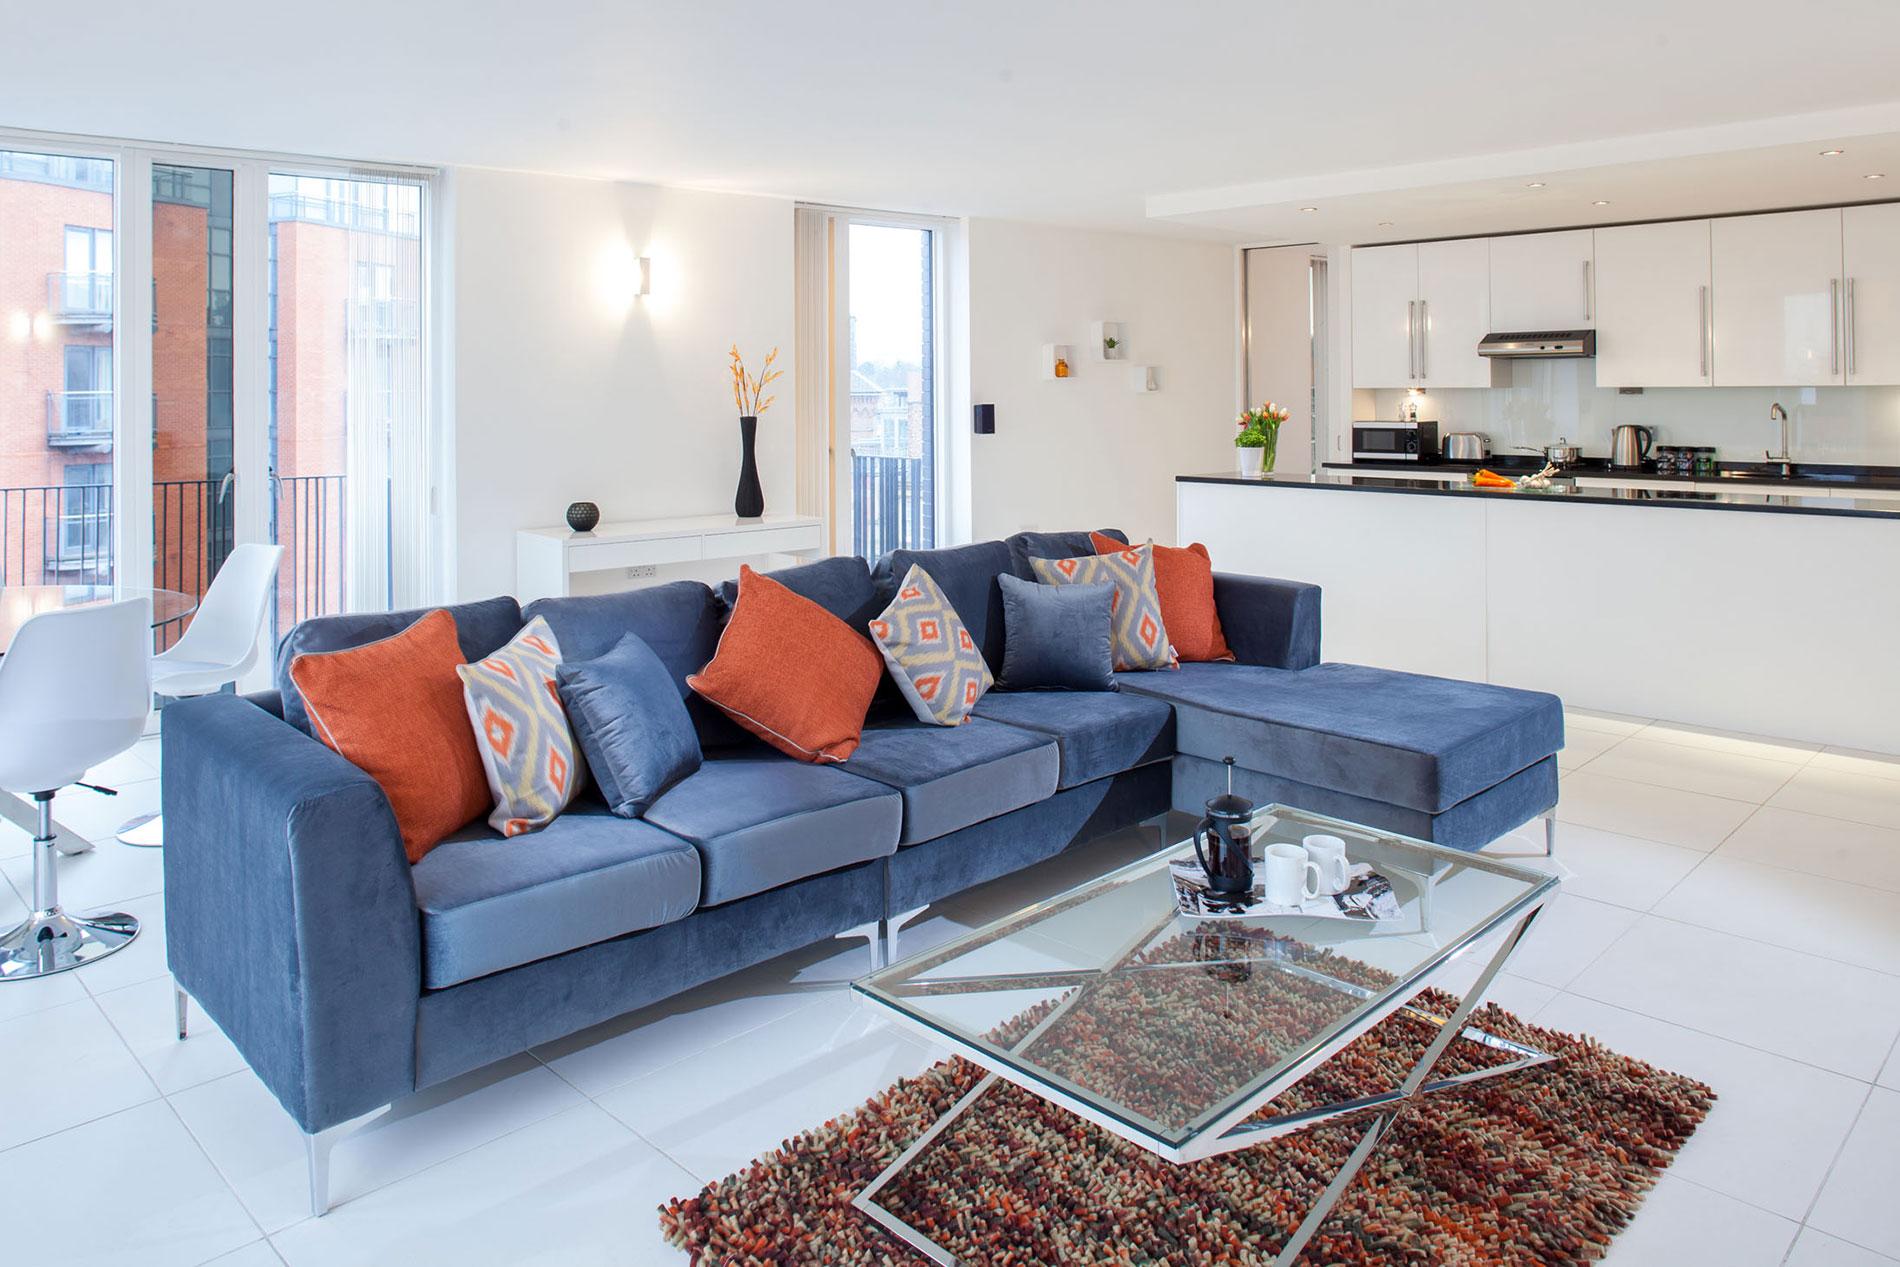 Cushions at Sinclair Apartments, Centre, Sheffield - Citybase Apartments